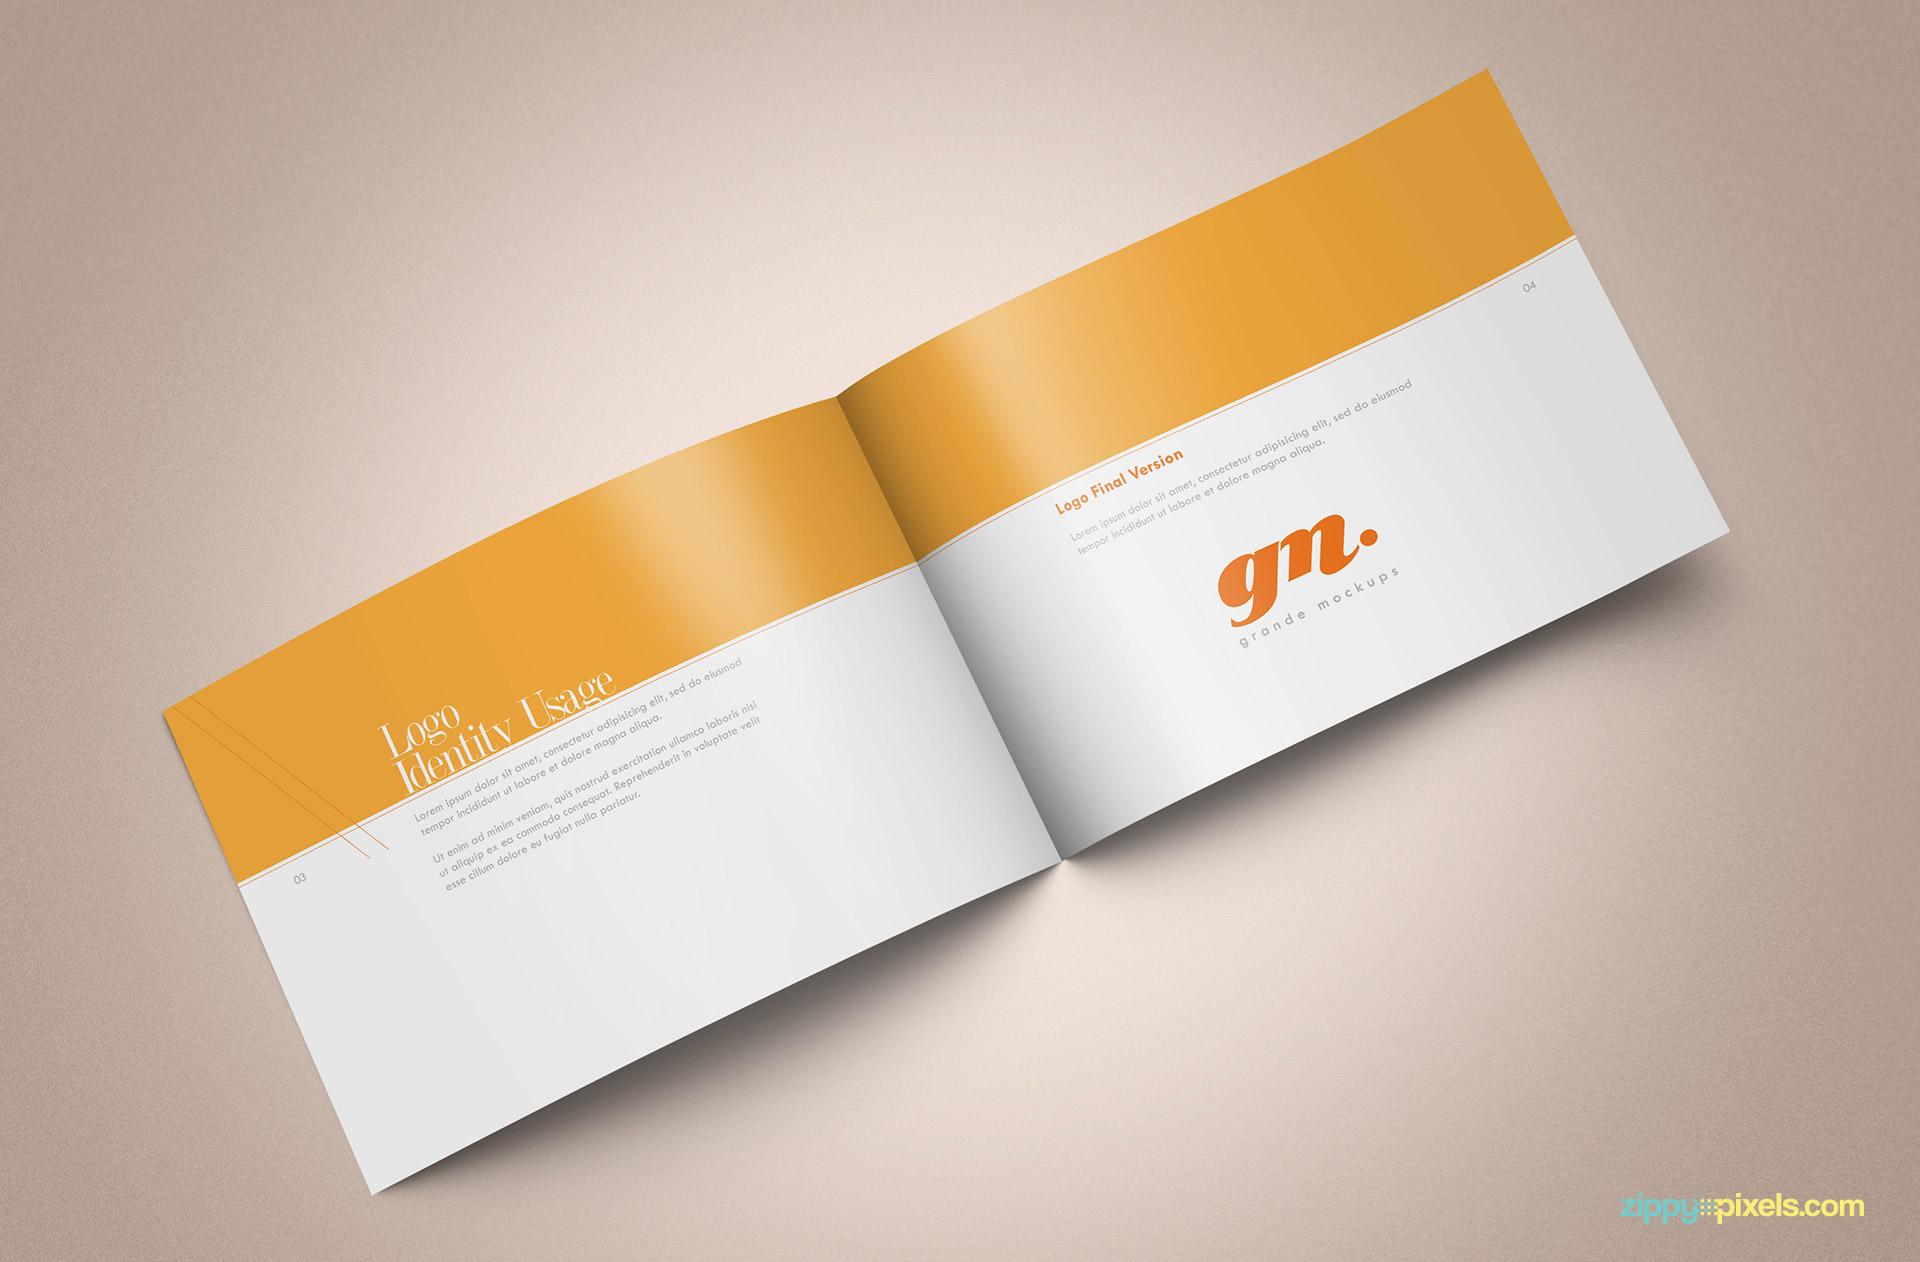 05-brand-book-4-logo-identity-usage